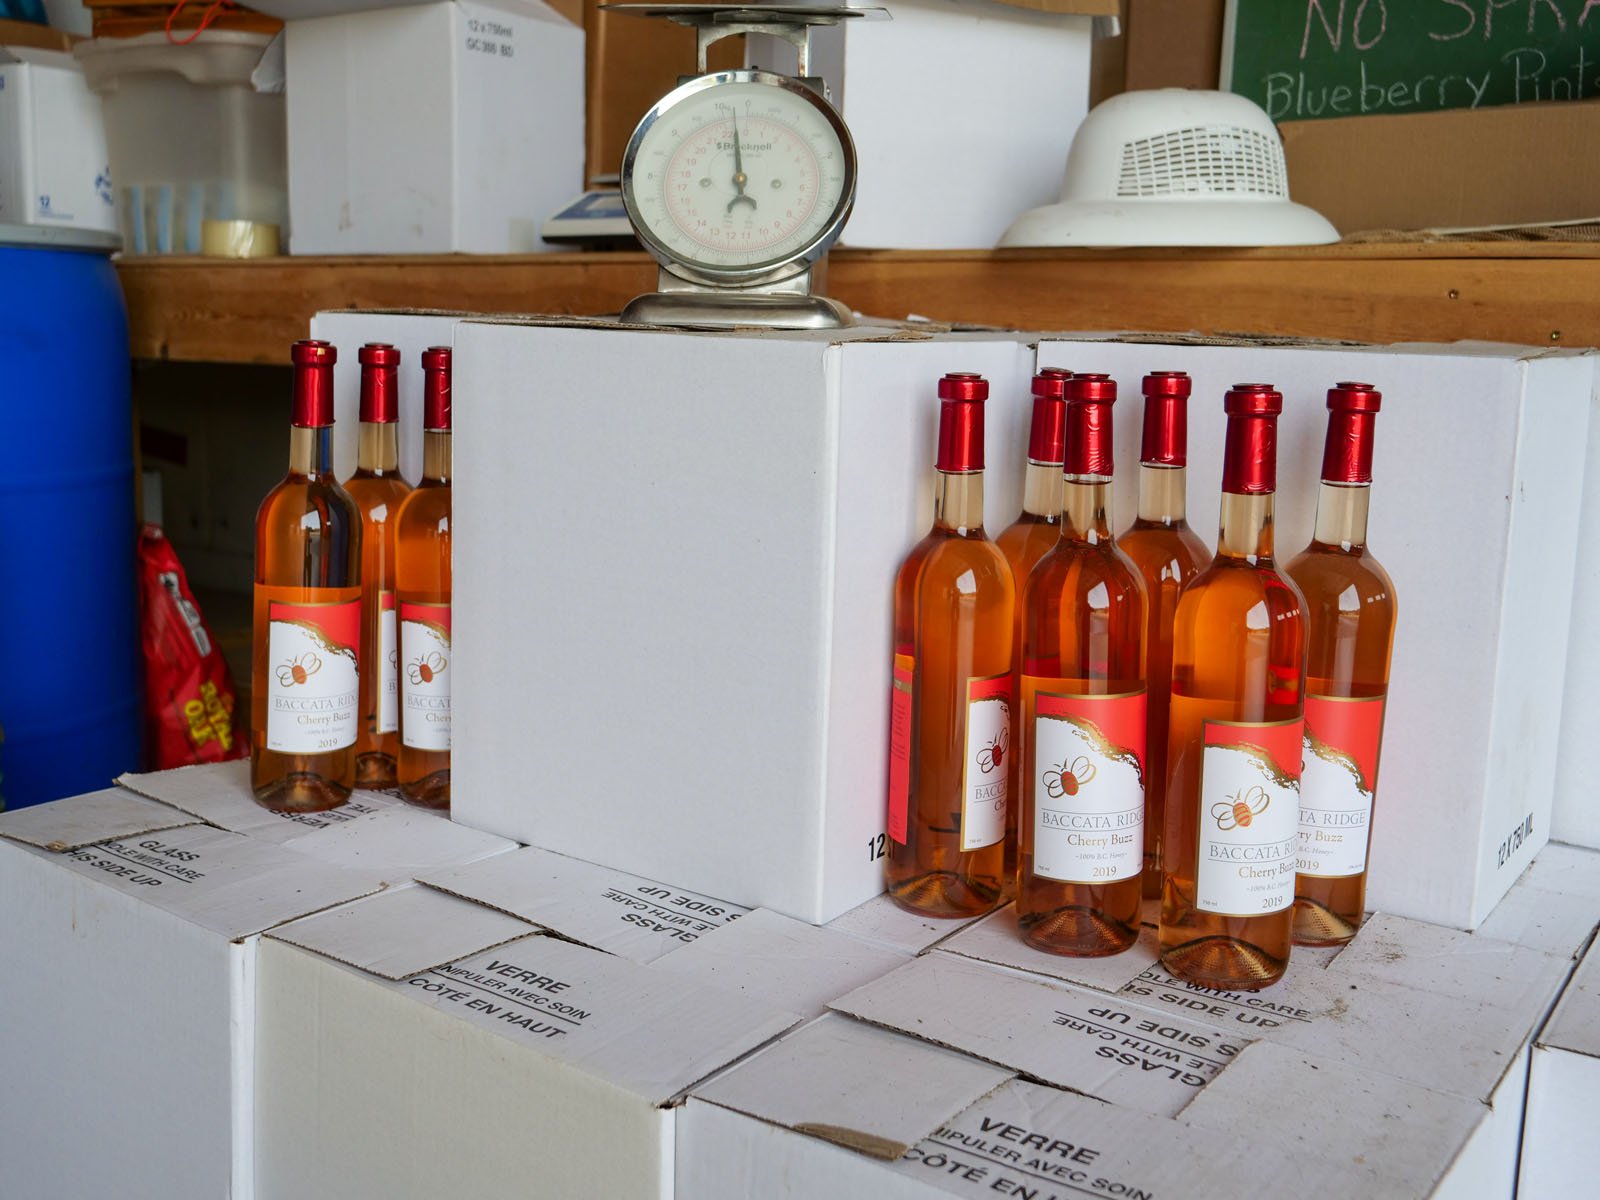 Baccata ridge winery 41